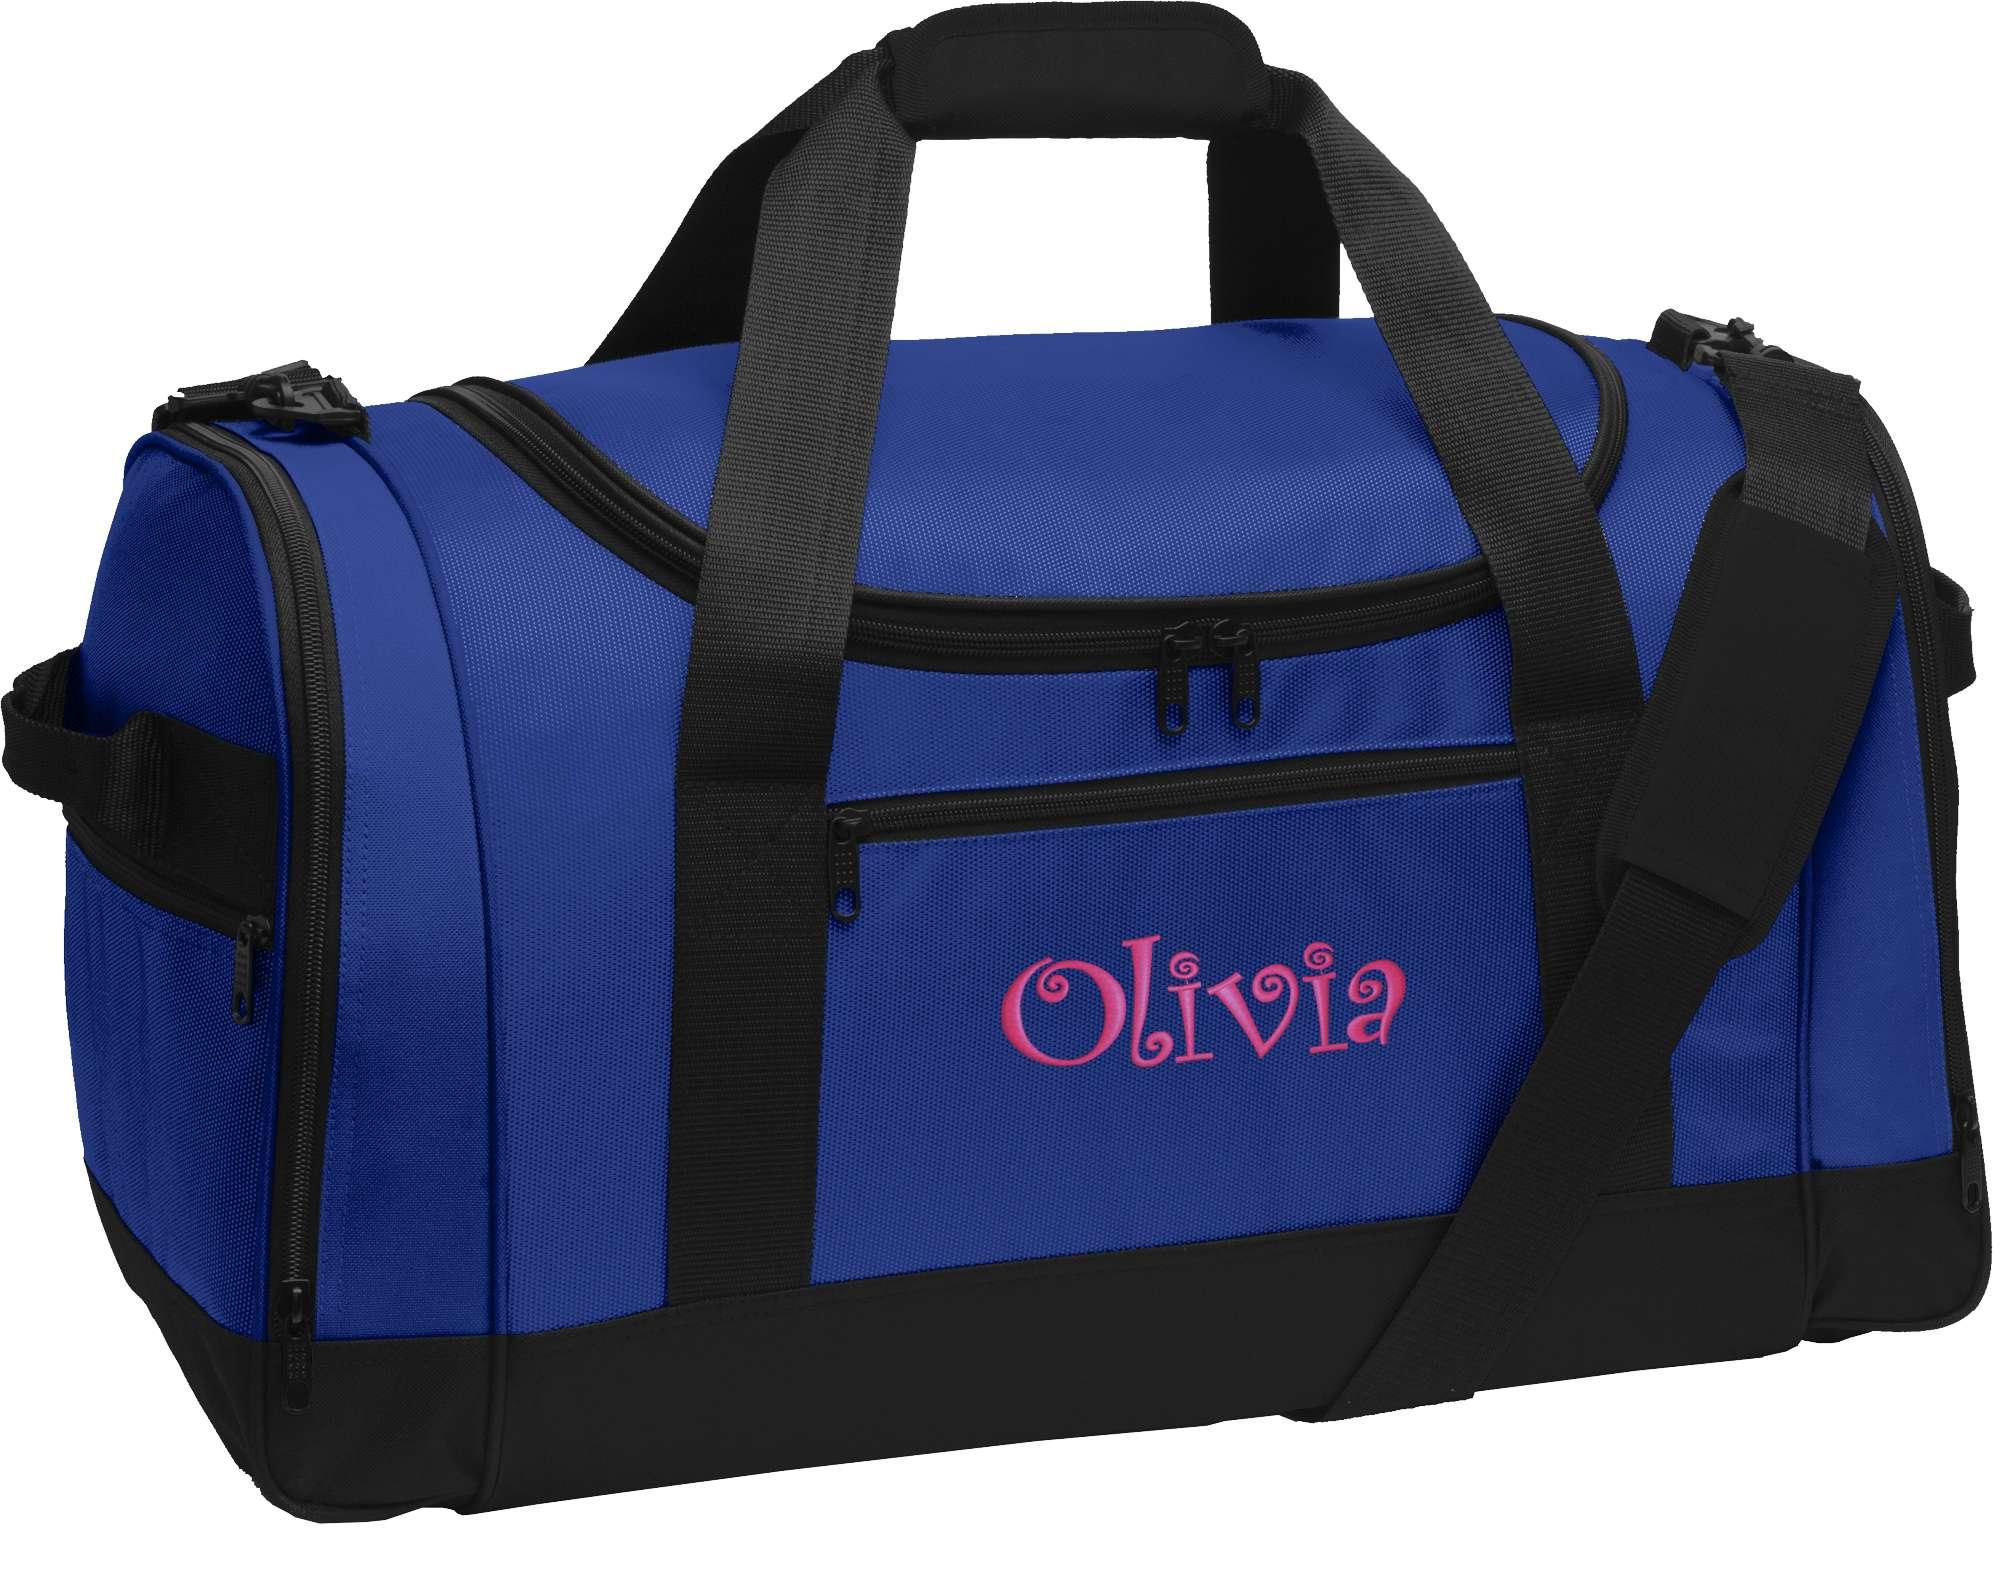 Travel Luggage Duffle Bag Lightweight Portable Handbag Surfing Ocean Large Capacity Waterproof Foldable Storage Tote